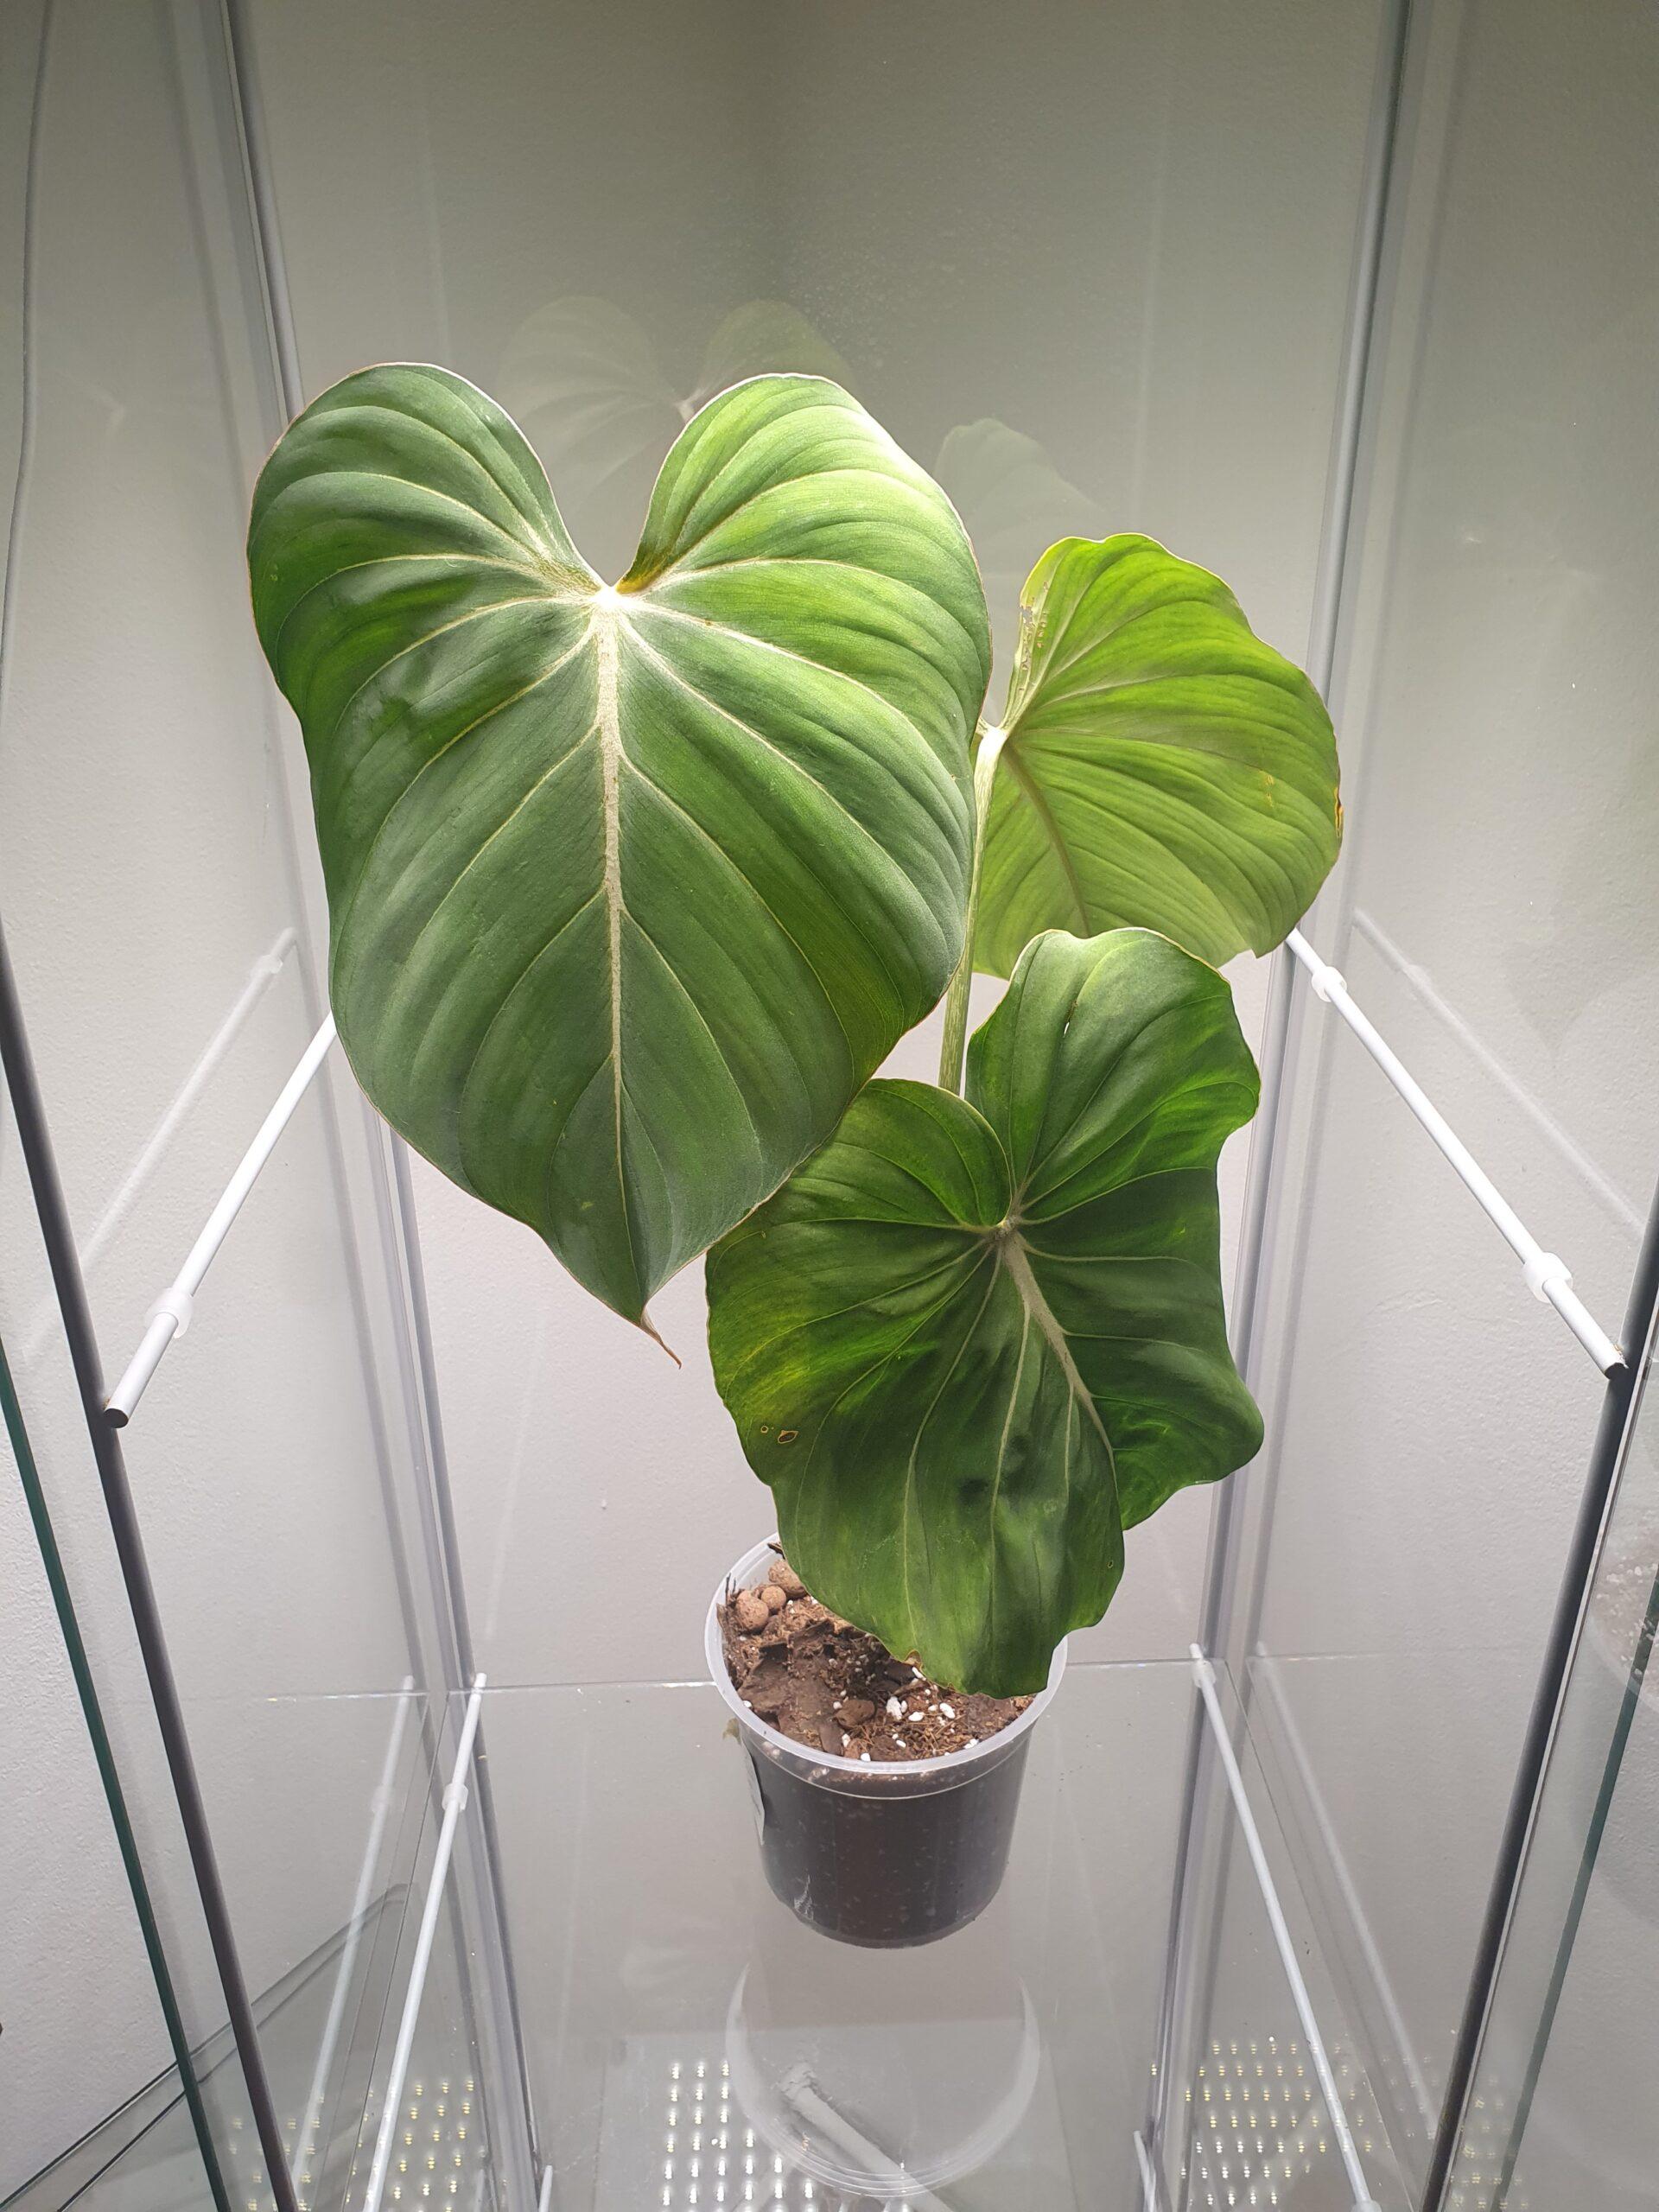 Gloriosum Philodendron